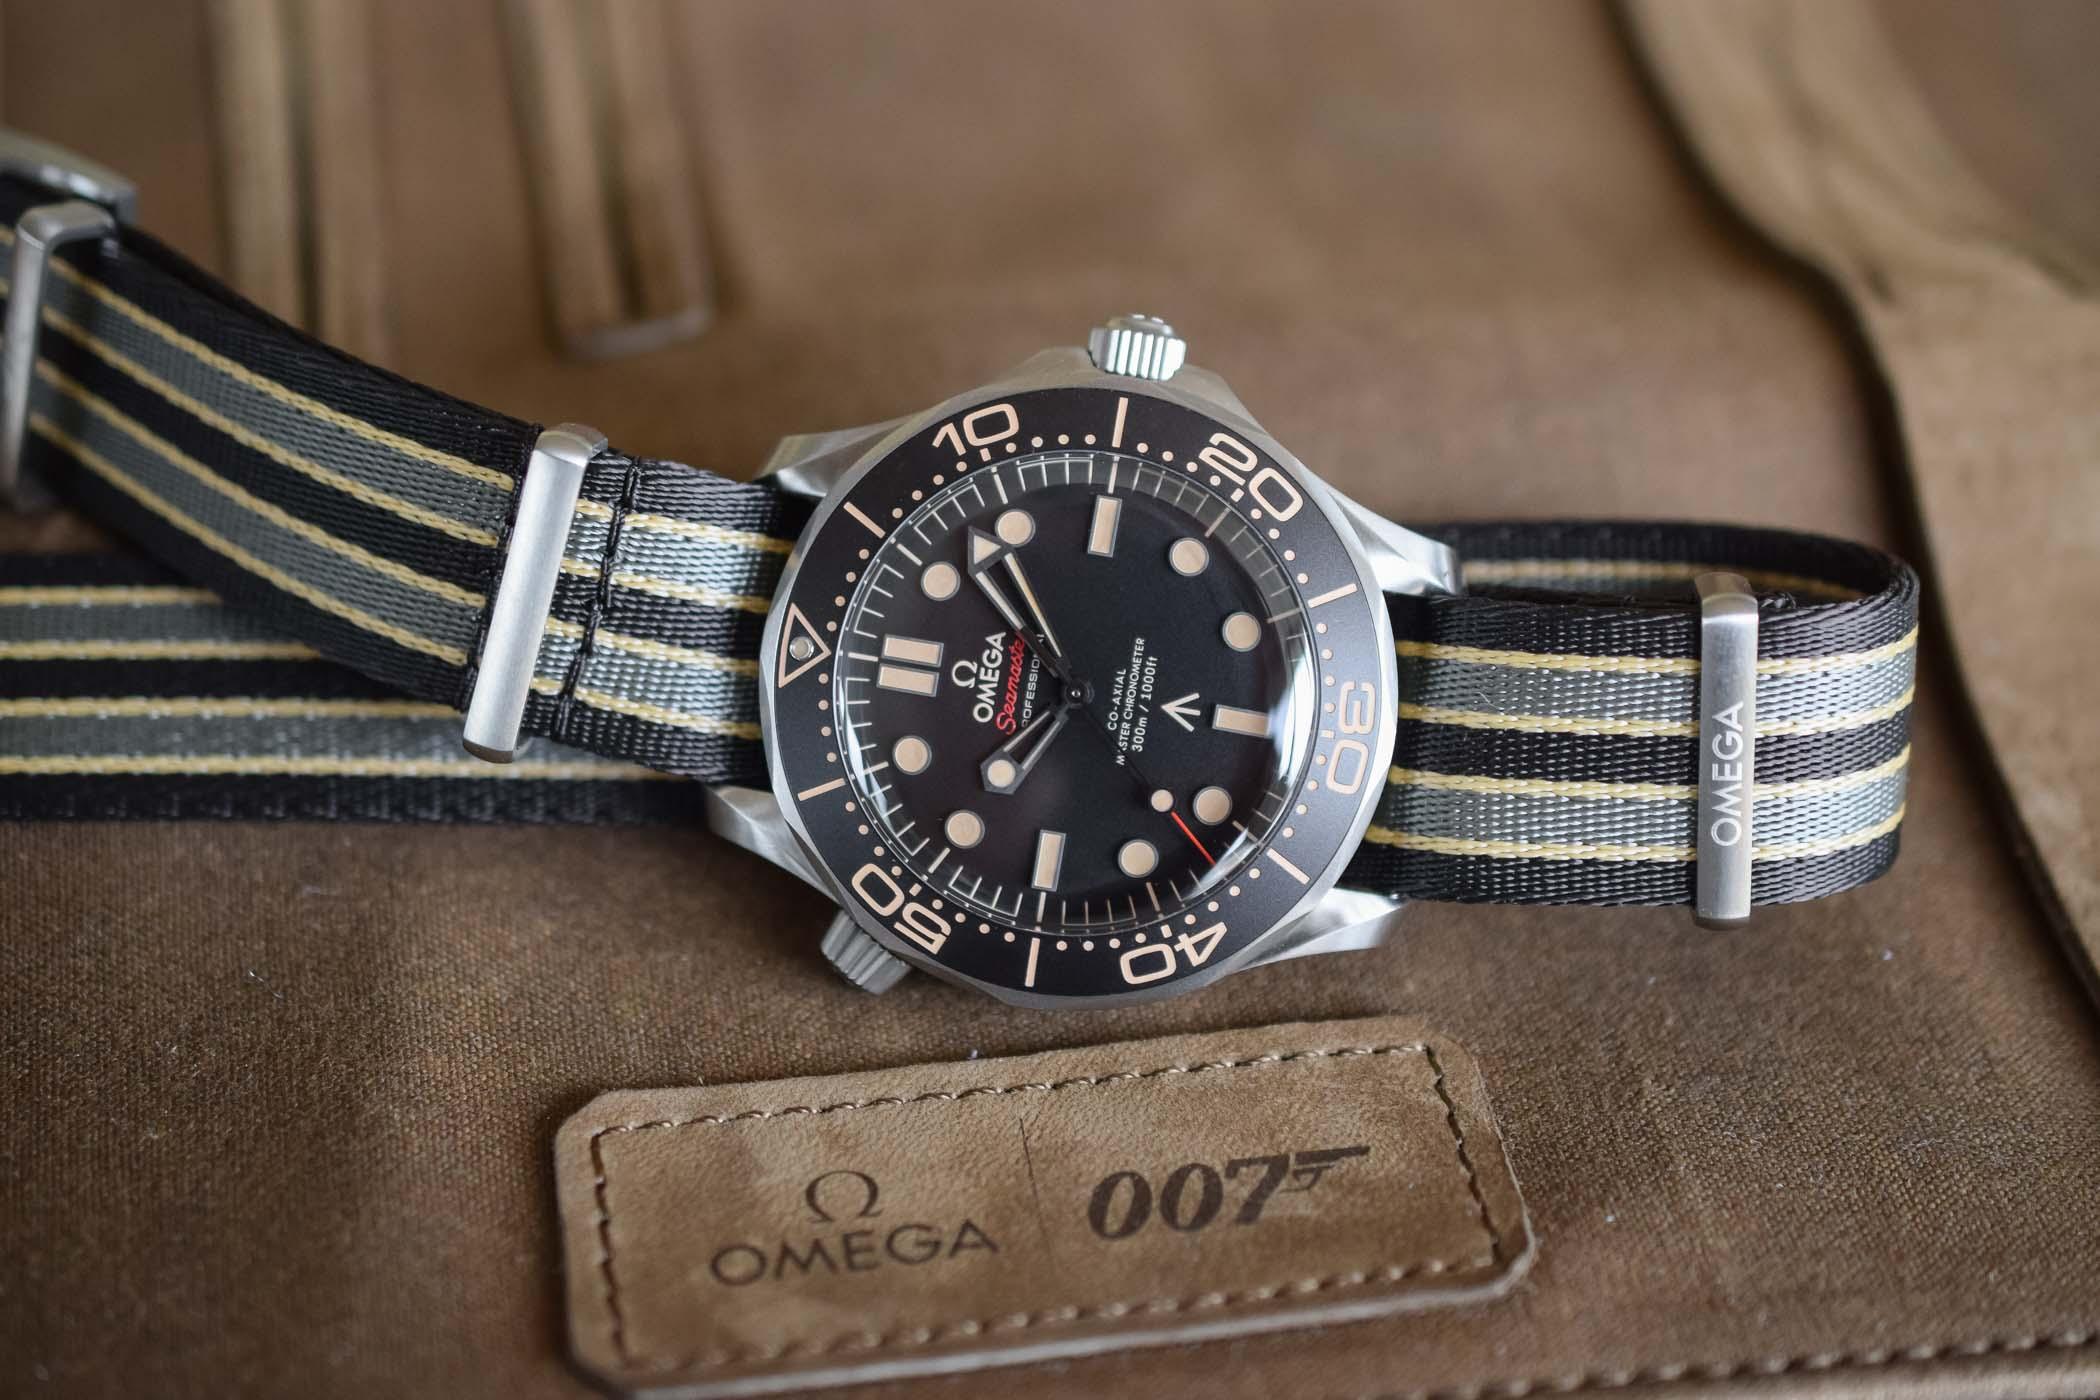 Name:  Omega-Seamaster-Diver-300M-007-Edition-210.90.42.20.01.001-8.jpg Views: 94 Size:  250.9 KB